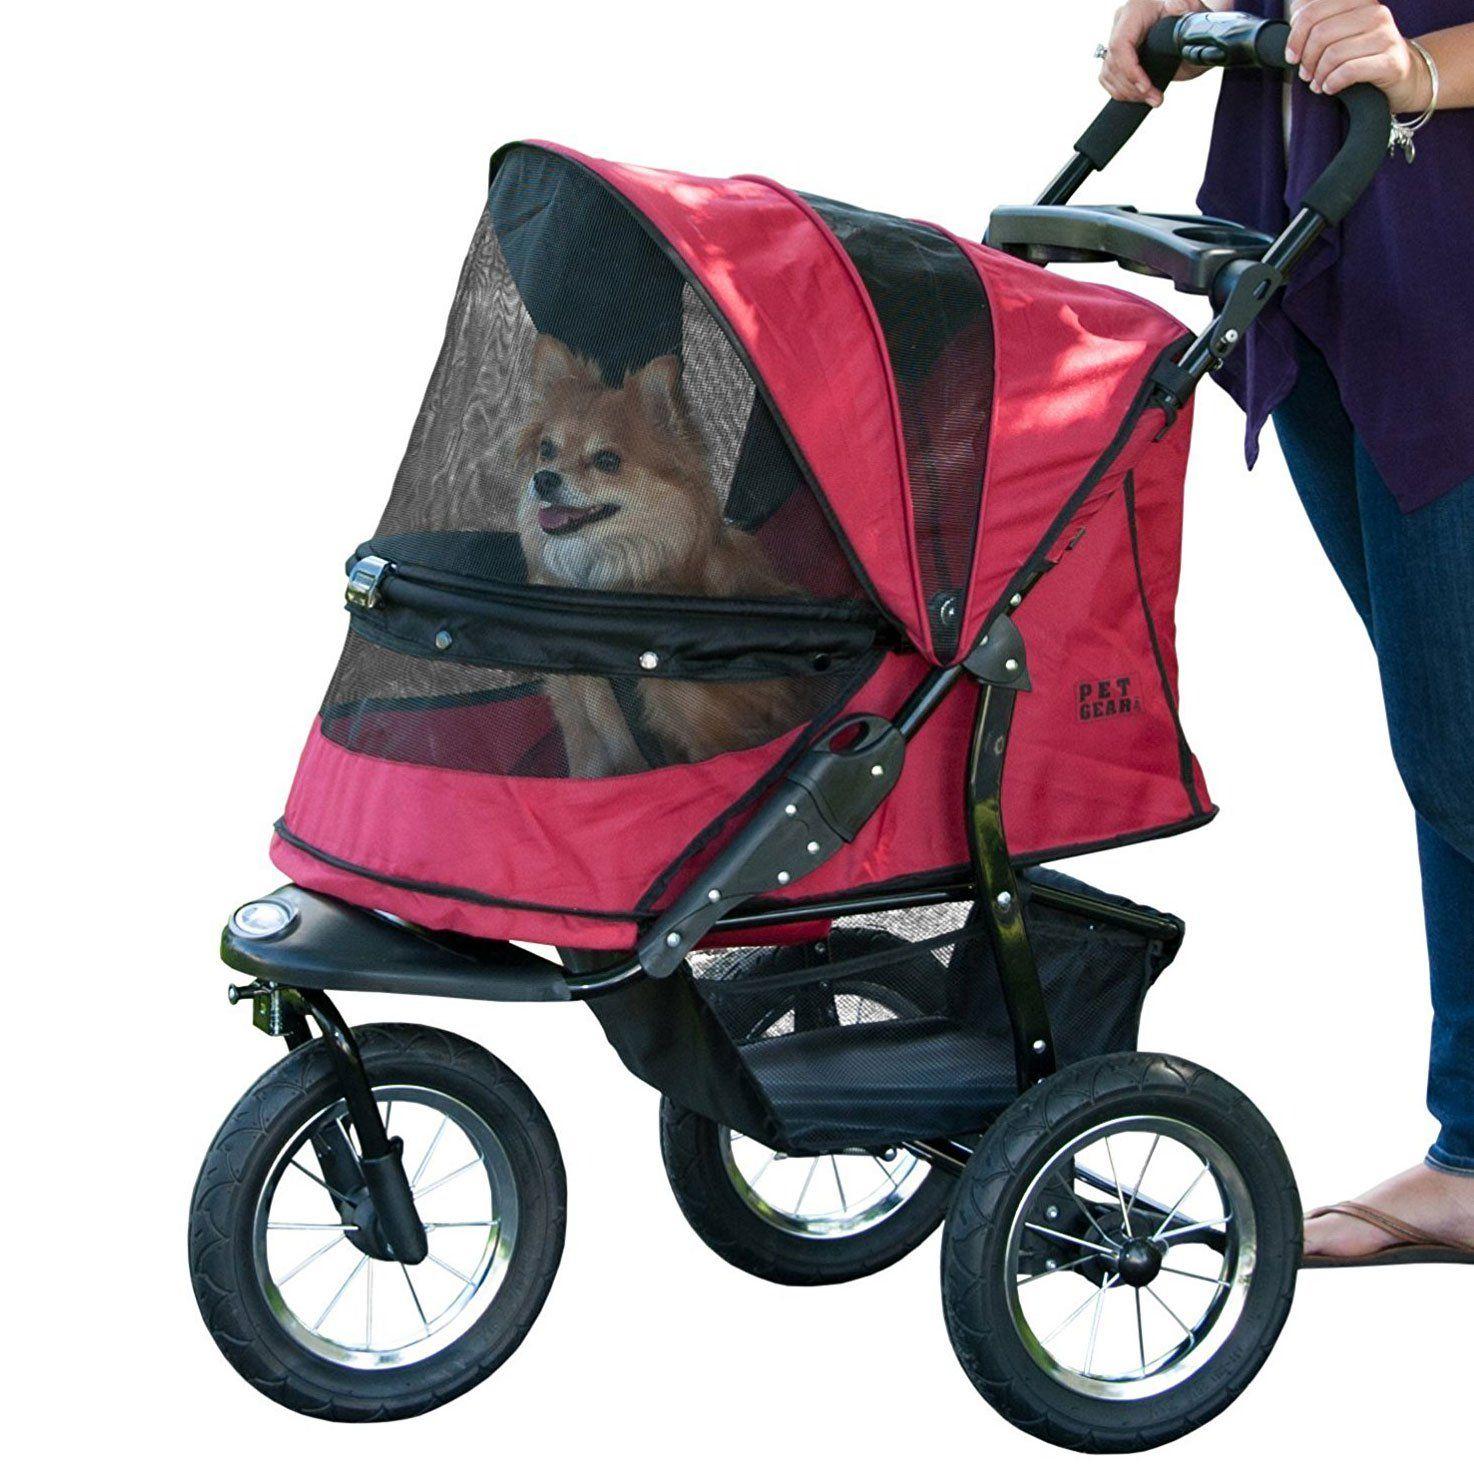 Pet Gear Lightweight Dog Jogging Stroller, Rugged Red